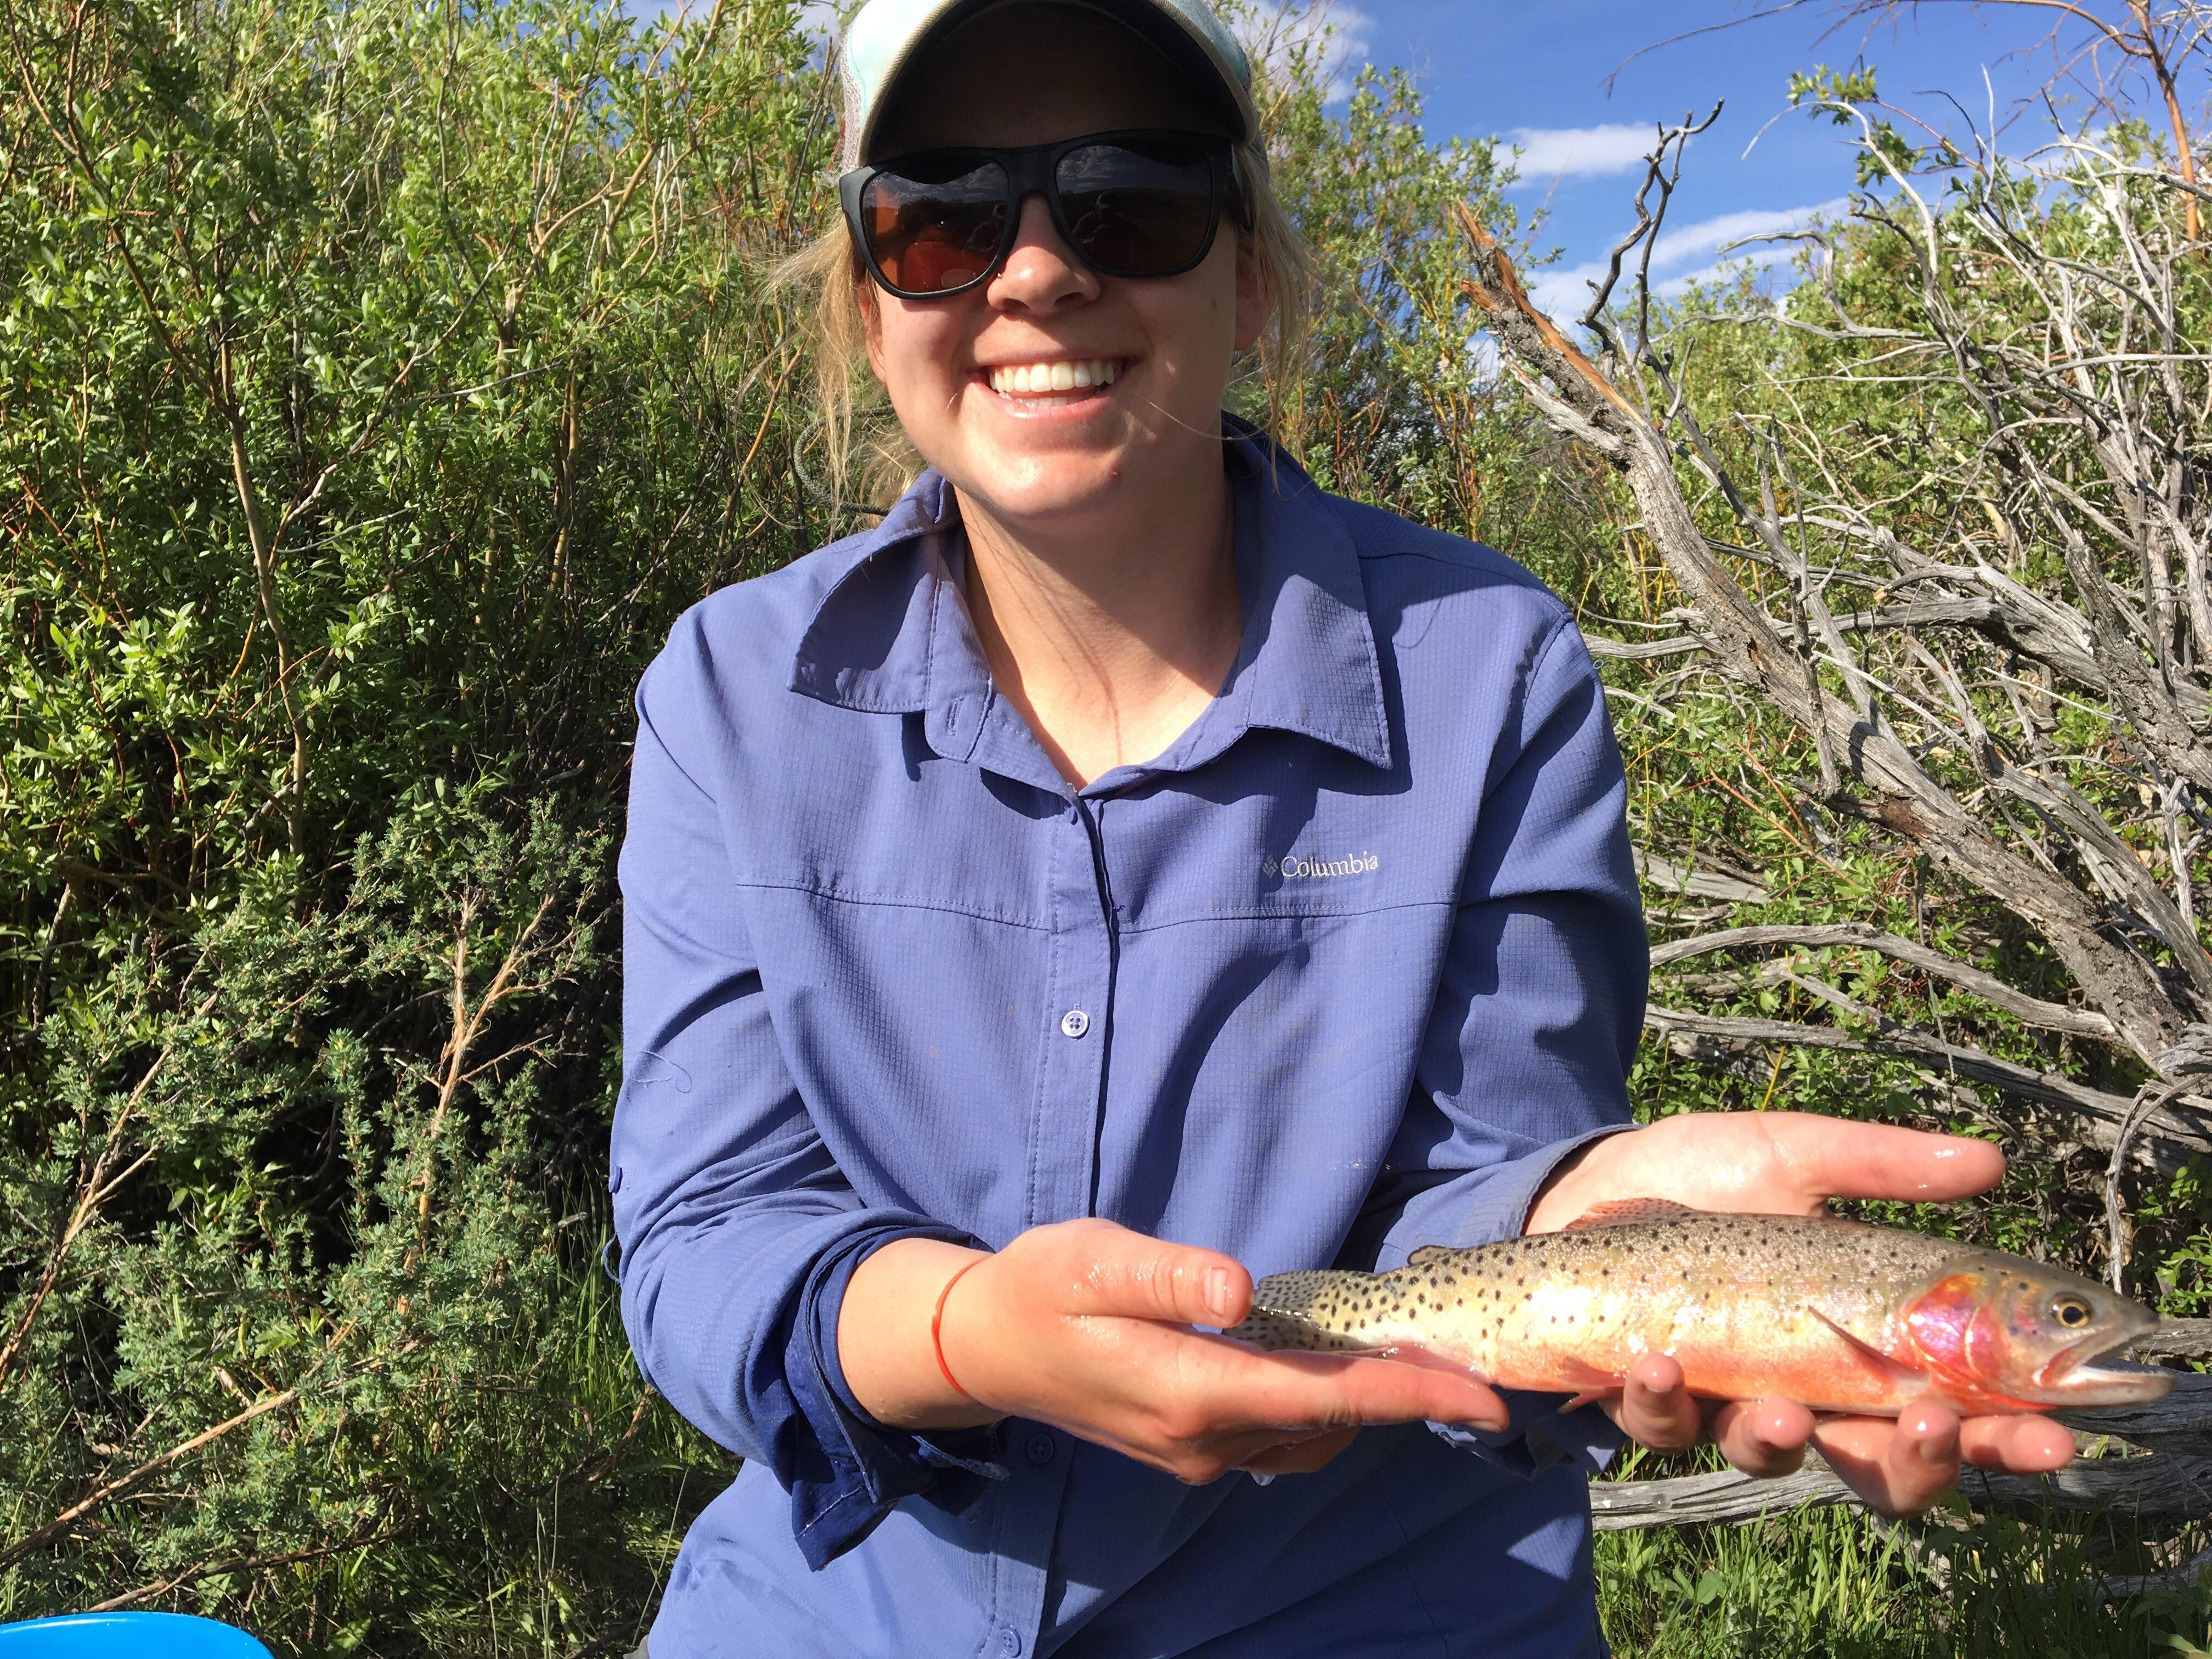 Colorado River cutthroat trout